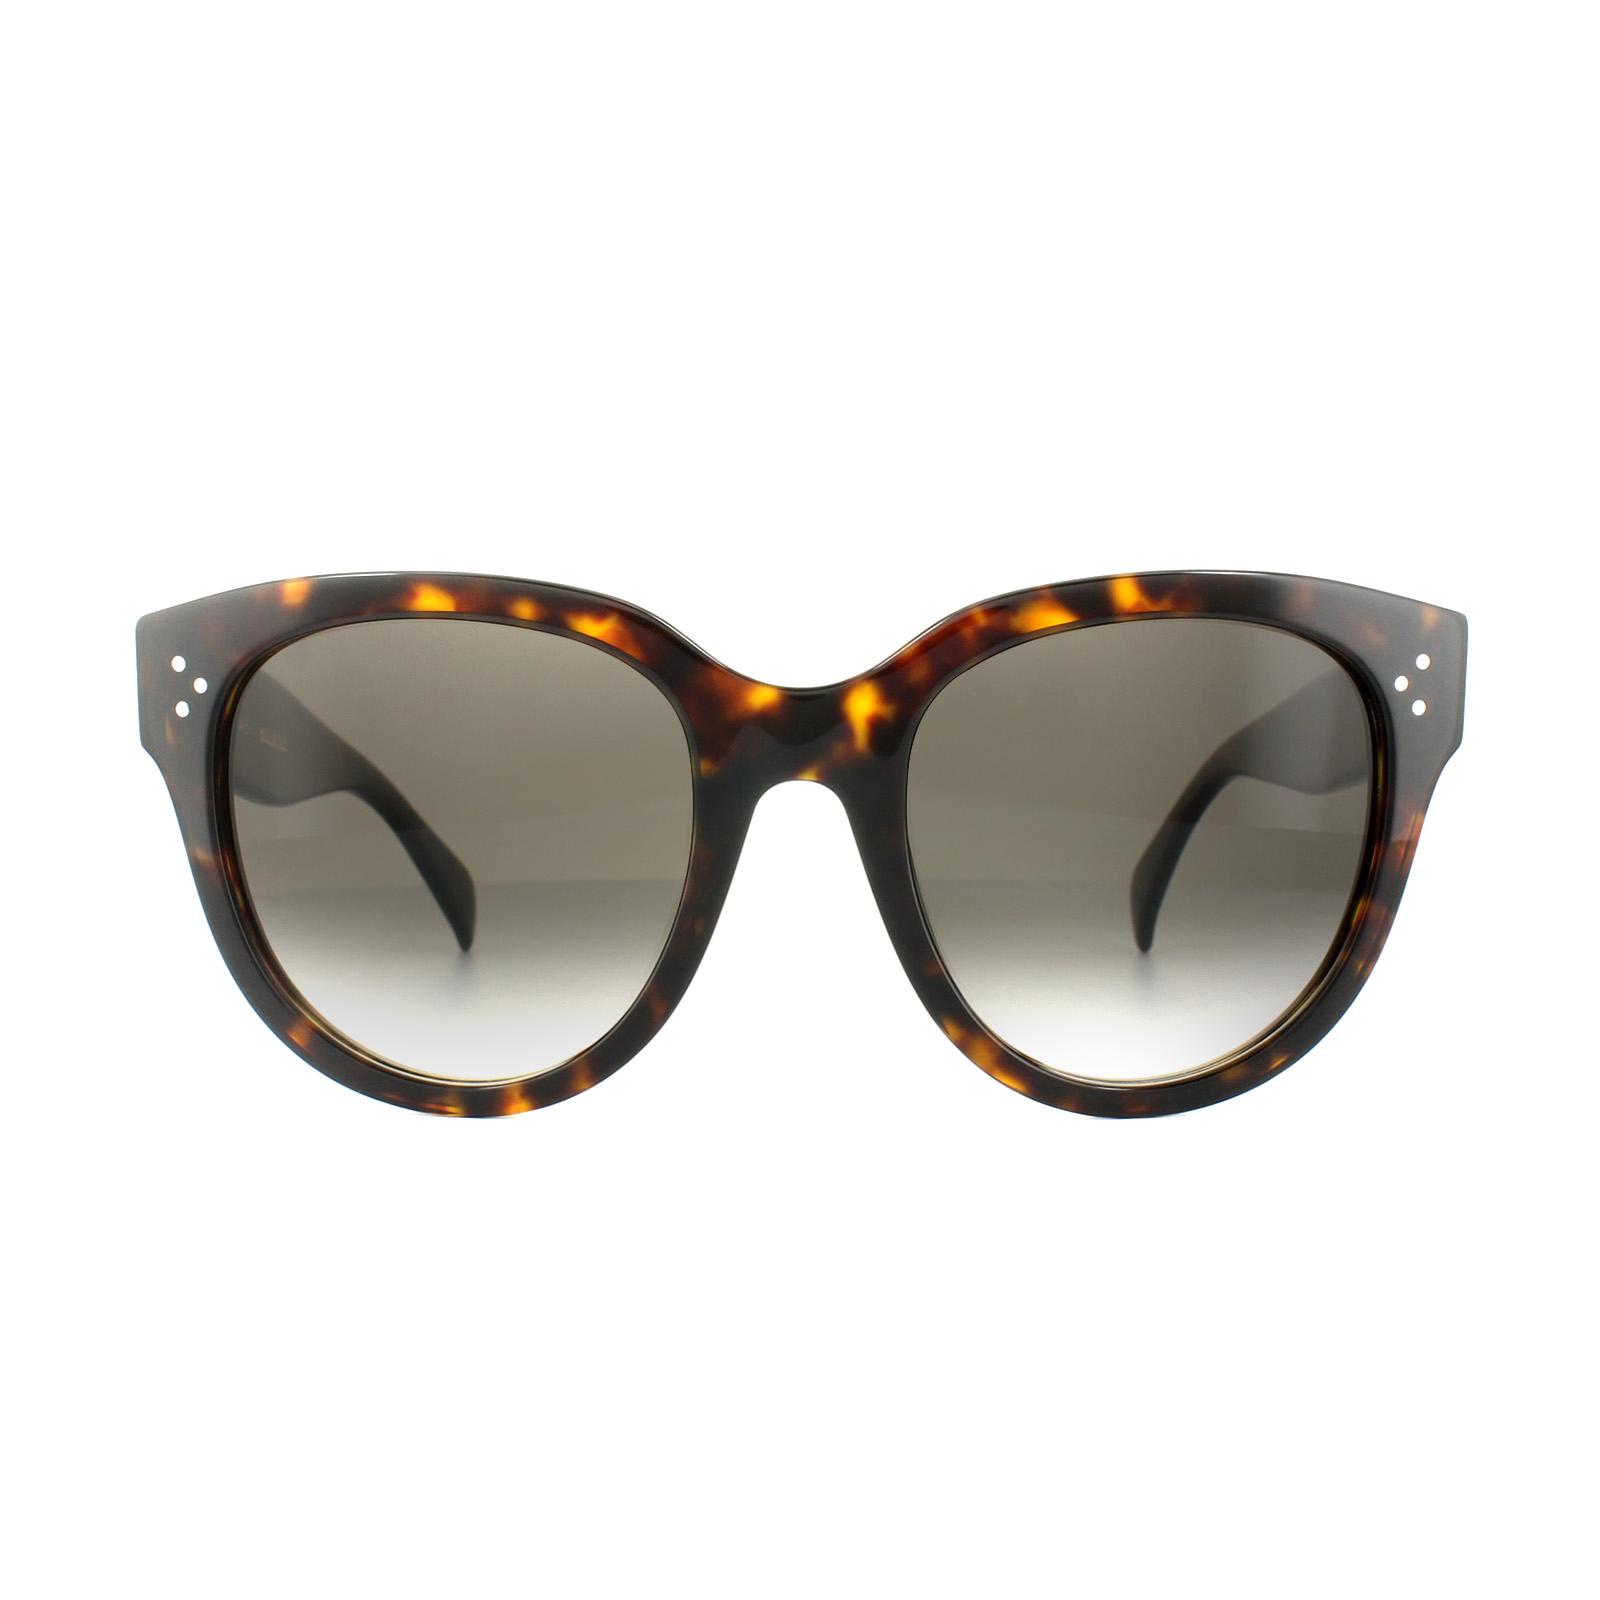 544e358e94bc1 Cheap Celine 41755 S Audrey Sunglasses - Discounted Sunglasses